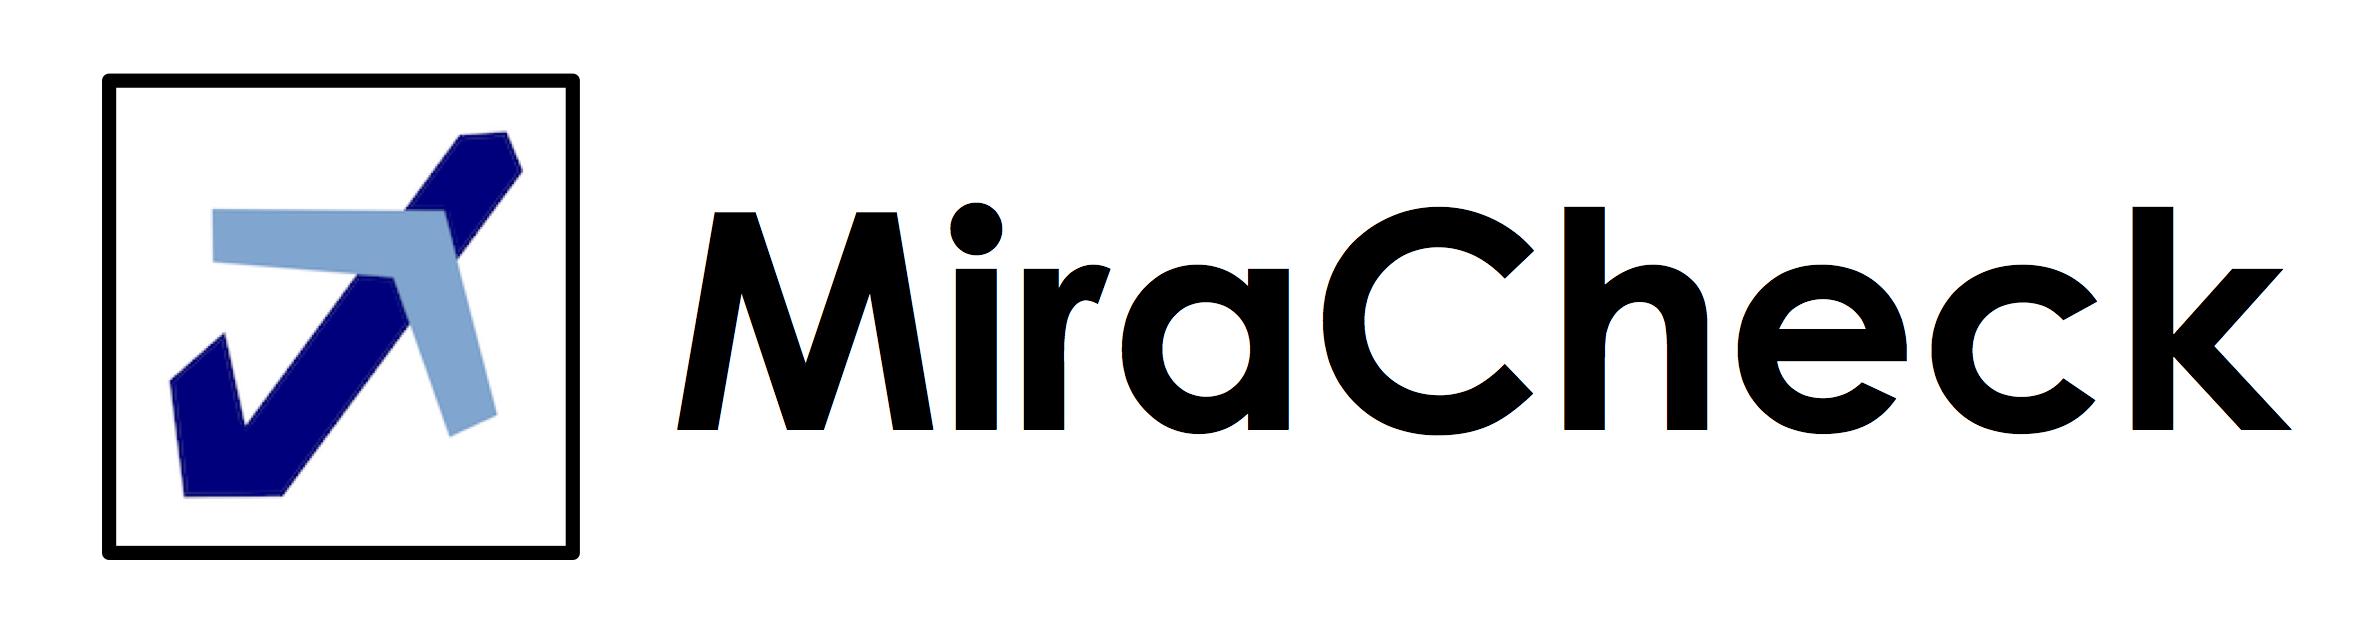 MiraCheck